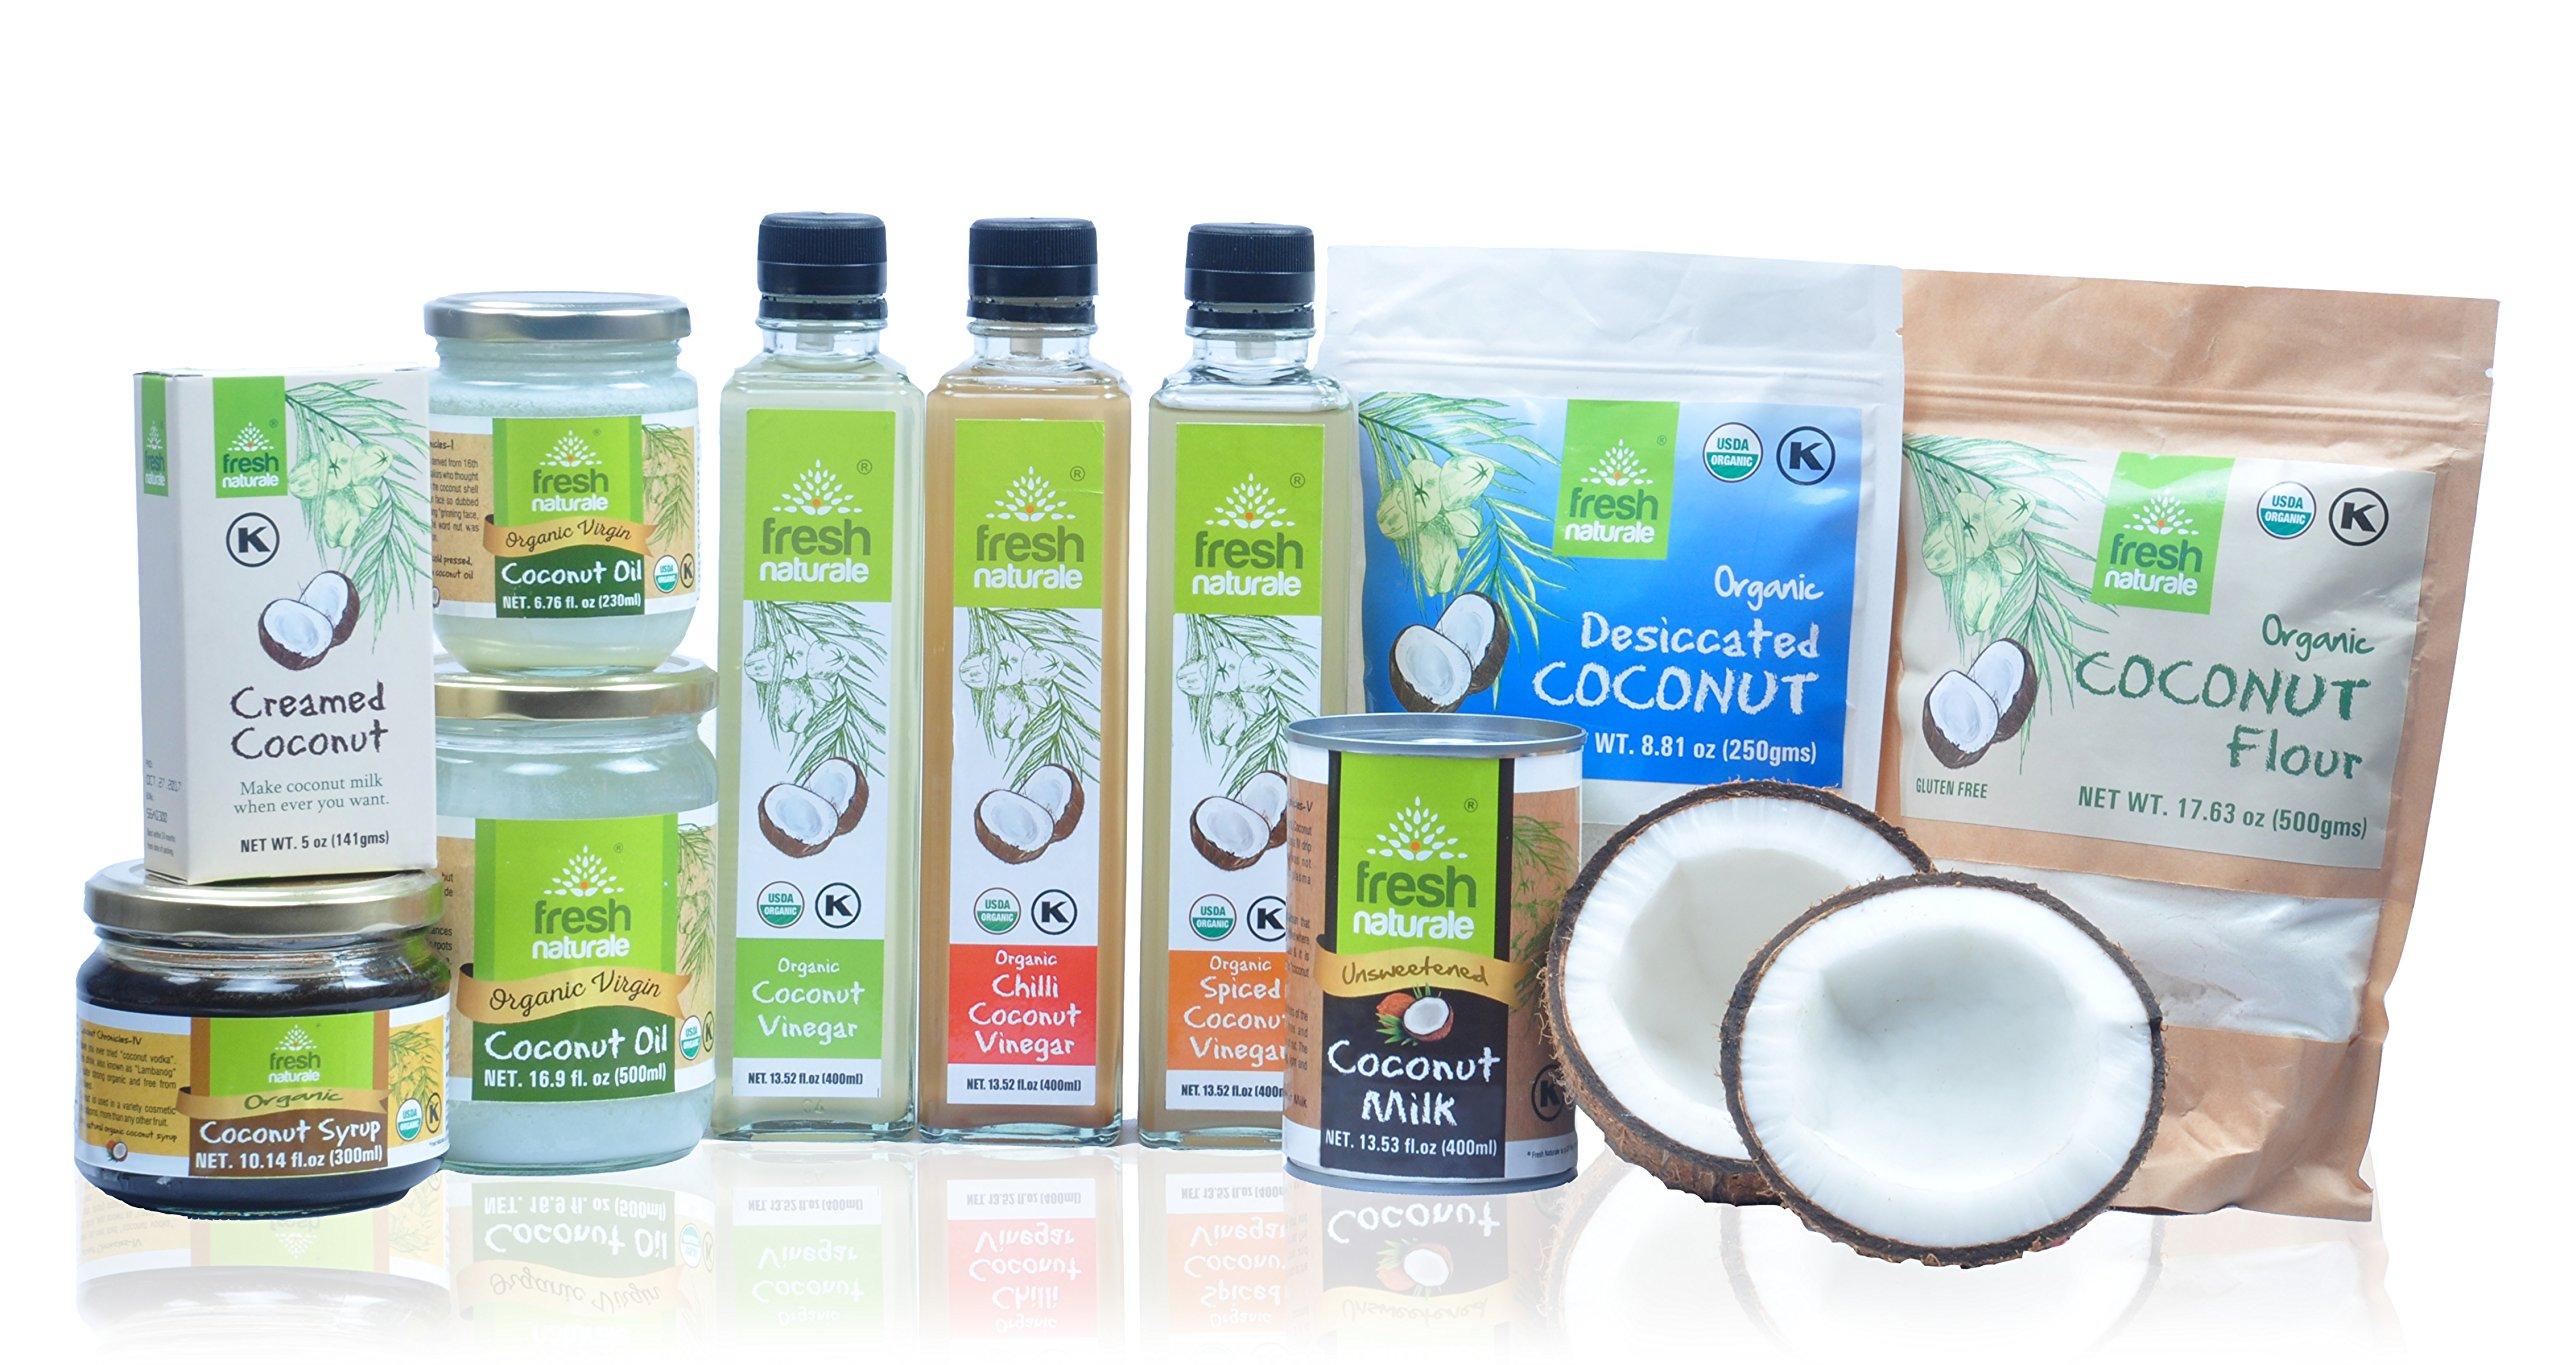 Everything Coconut (8) ITEMS: Coconut Syrup, Spiced Coconut Vinegar, Creamed Coconut, Desiccated Flour, Coconut Flour, Coconut Milk, Coconut Butter, and Coconut Oil 16.9 Oz